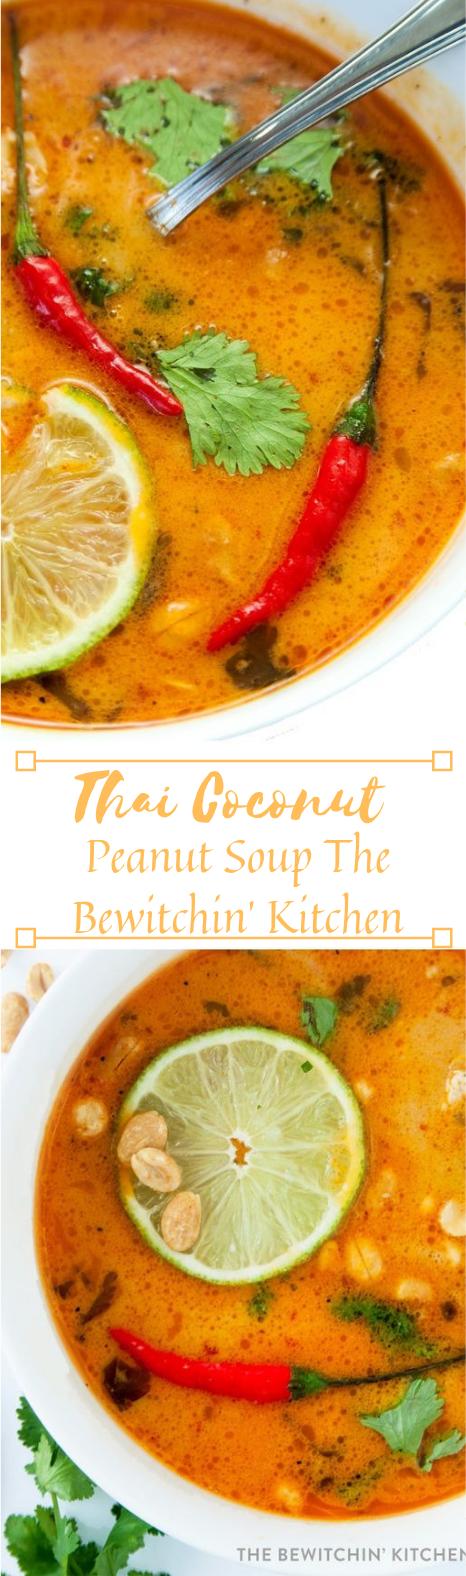 THAI COCONUT PEANUT SOUP #healthydinner #recipes #easy #soup #coconut